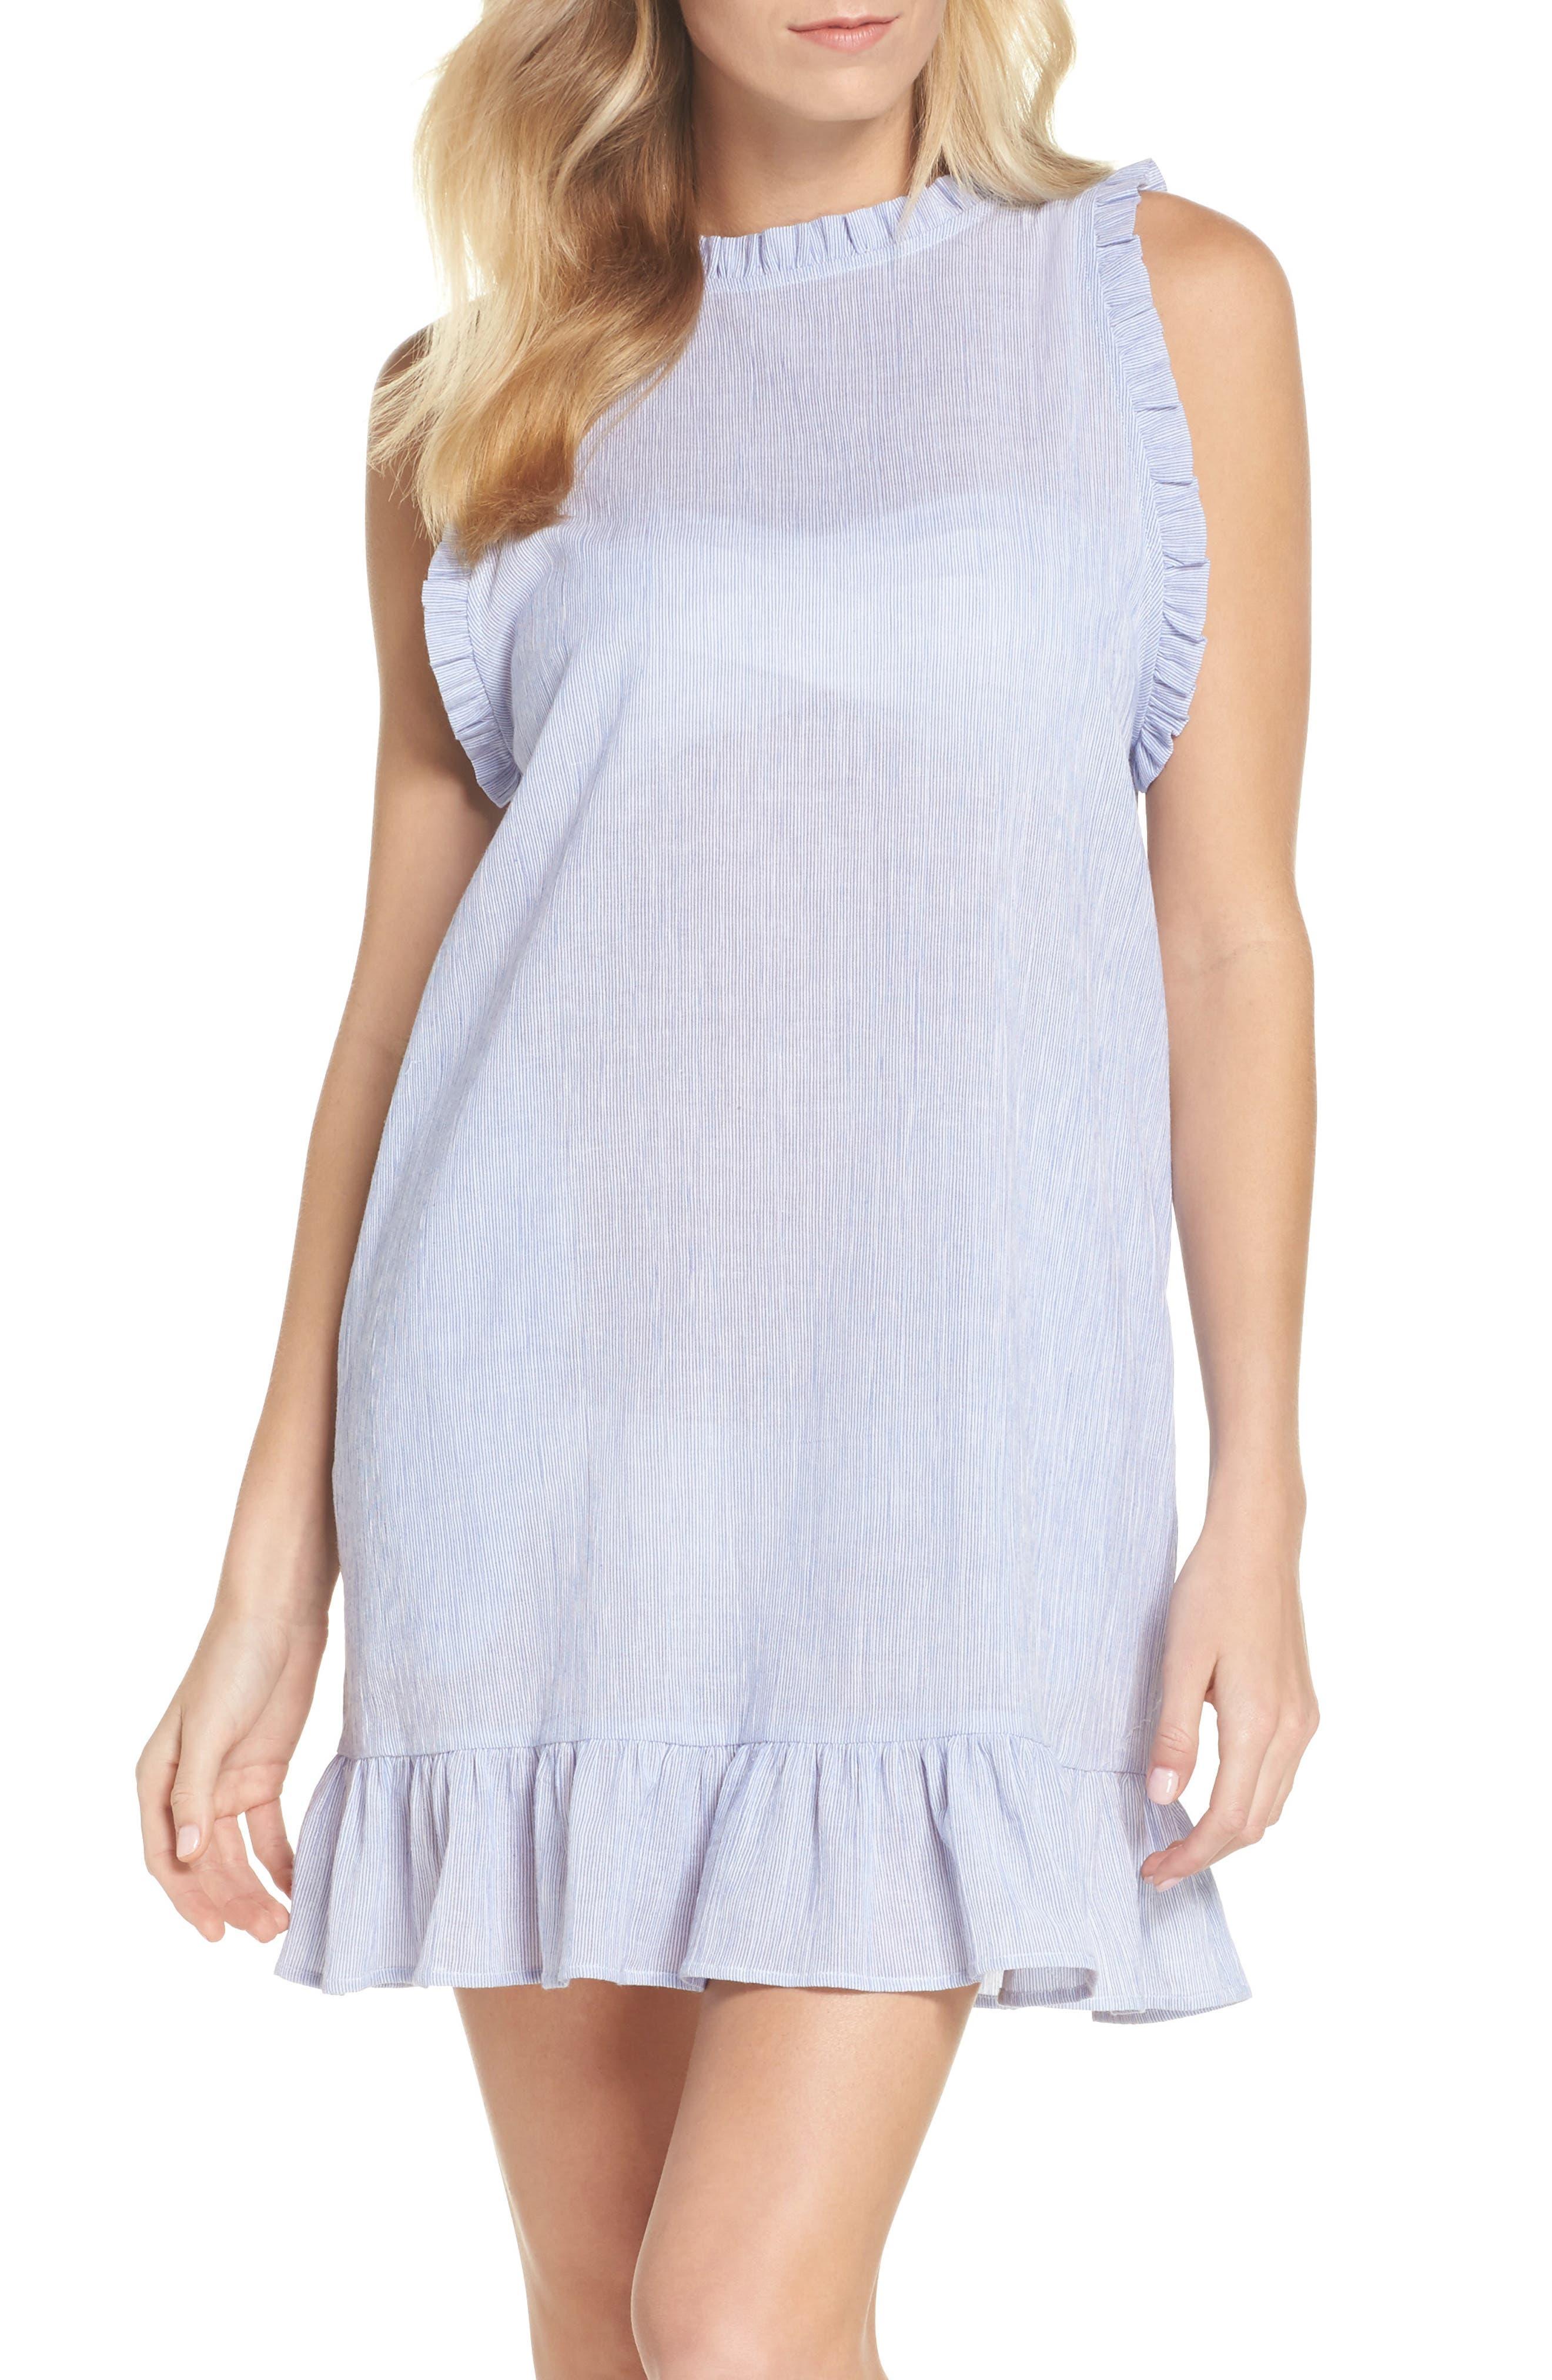 Muche et Muchette Heidi Cover-Up Dress